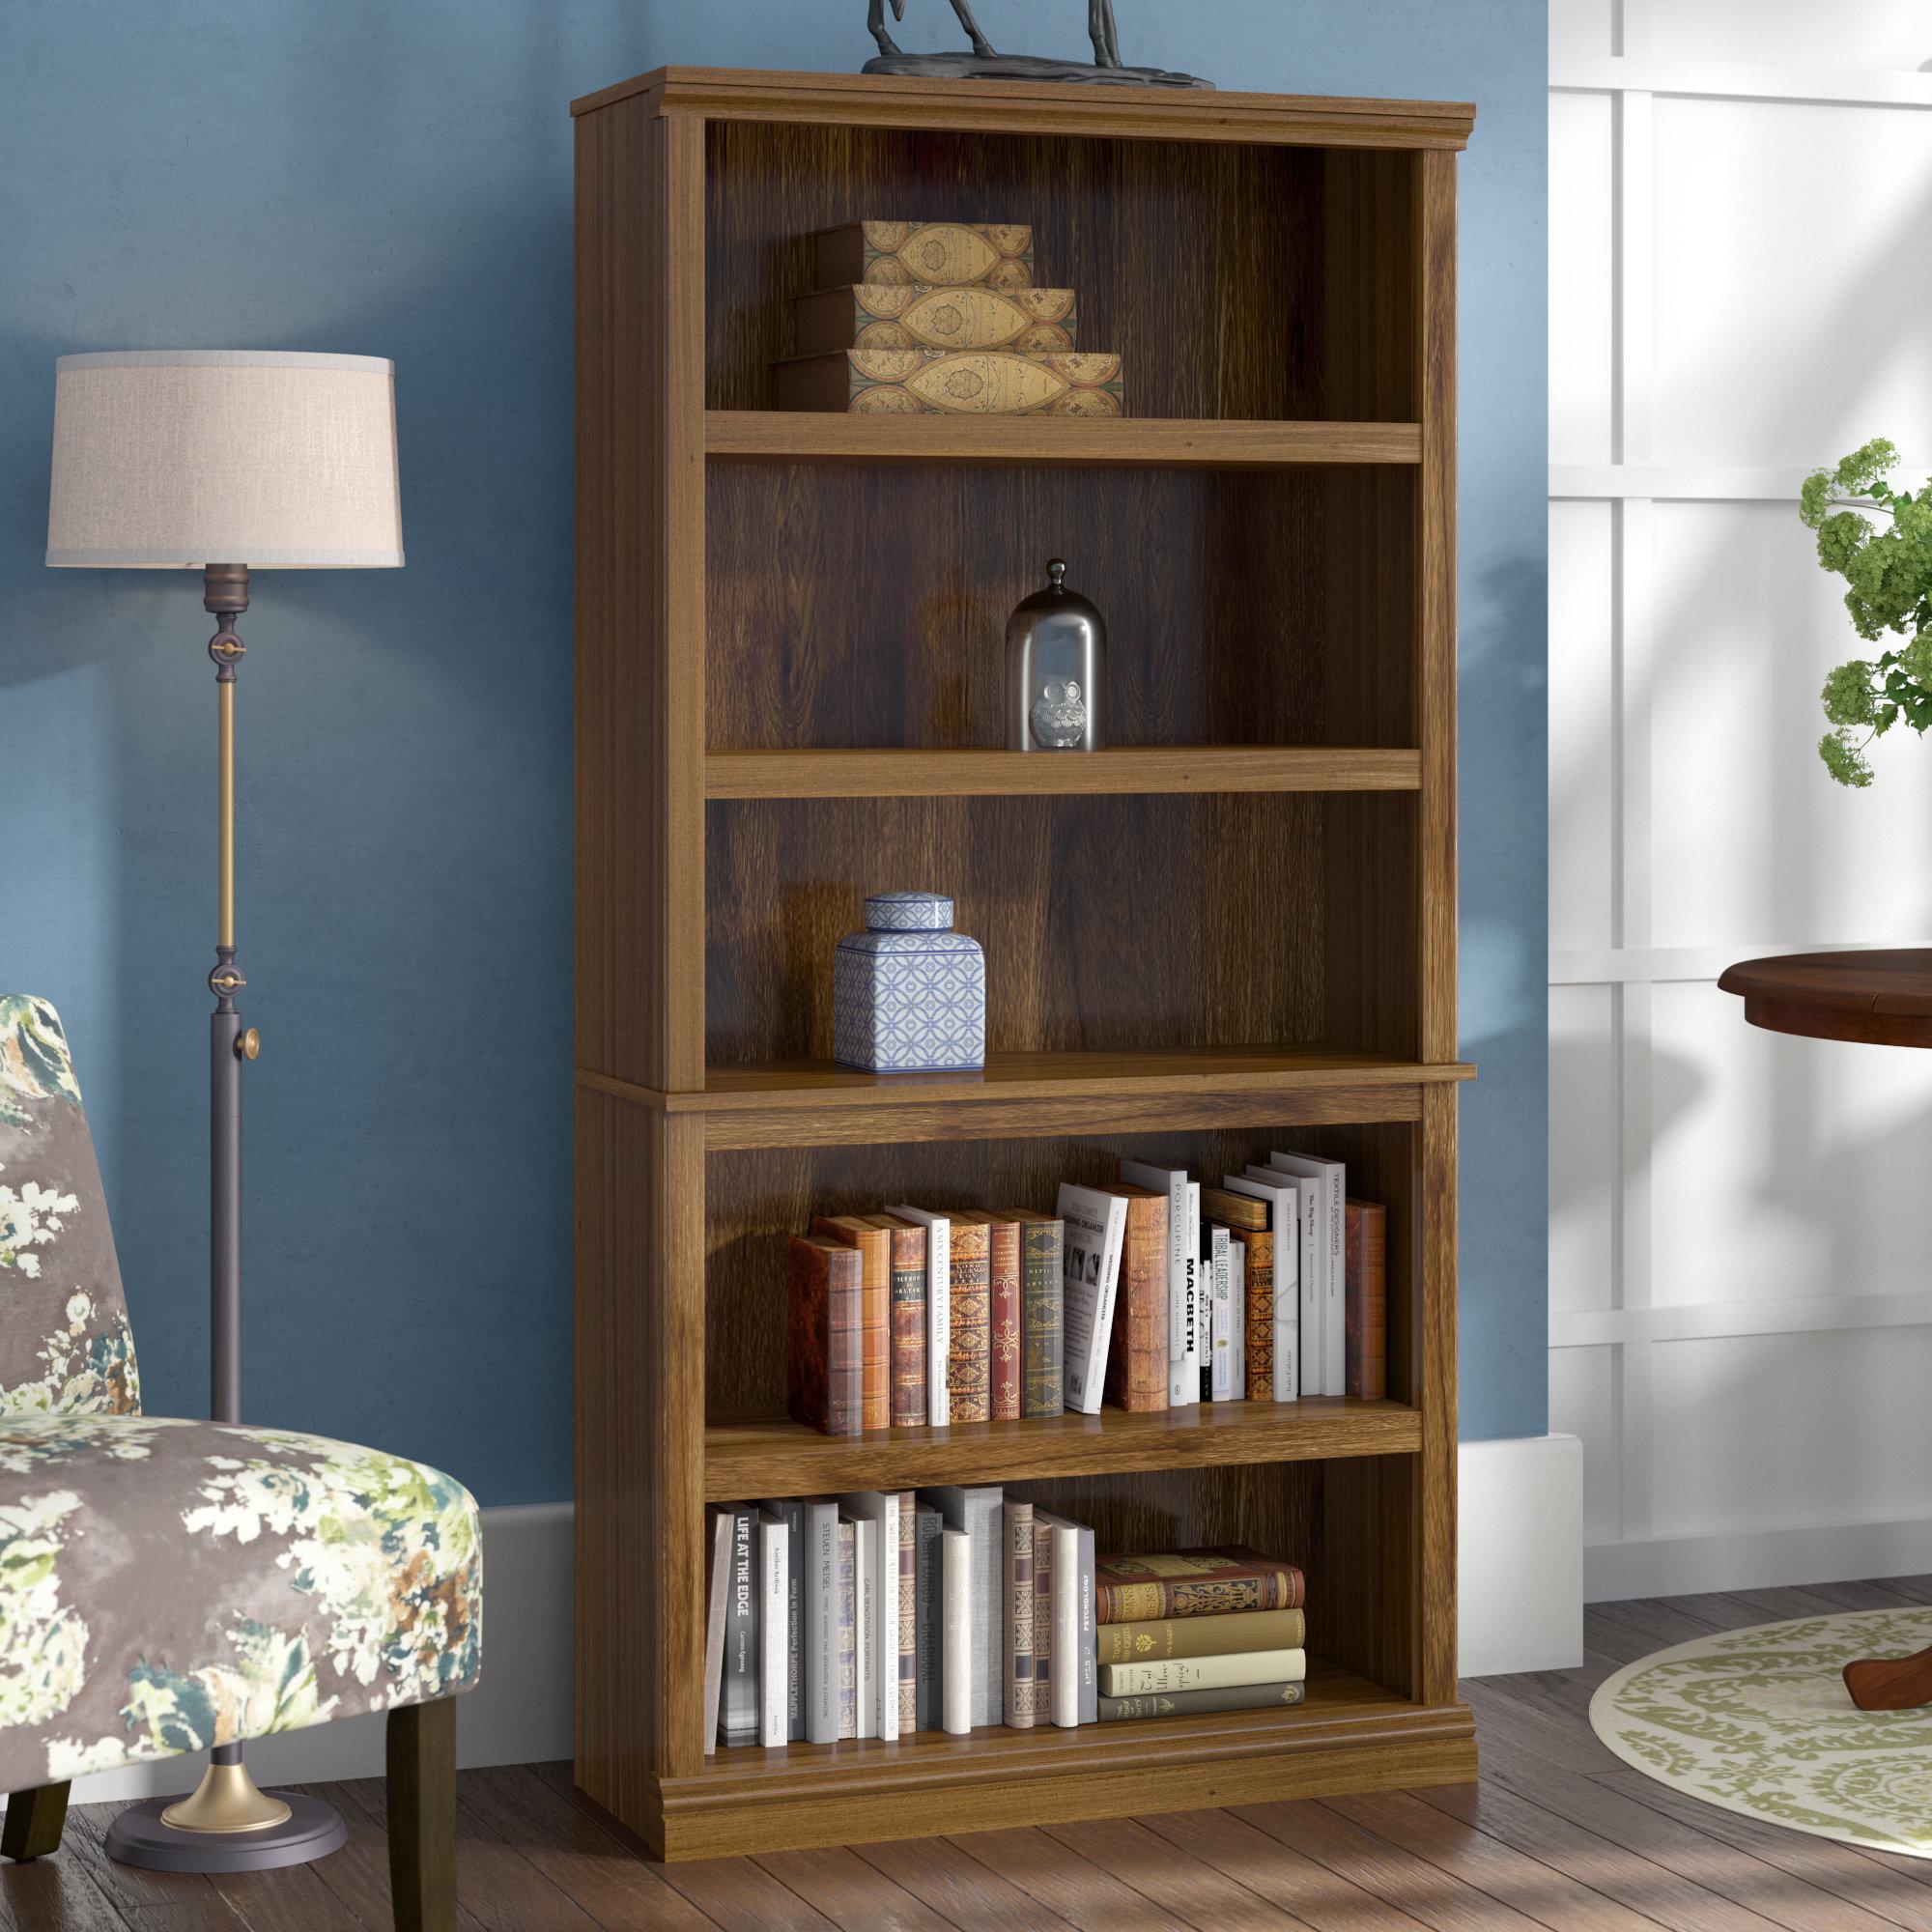 Three Posts Abigail Standard Bookcase & Reviews | Wayfair Regarding Abigail Ii Sofa Chairs (View 17 of 25)